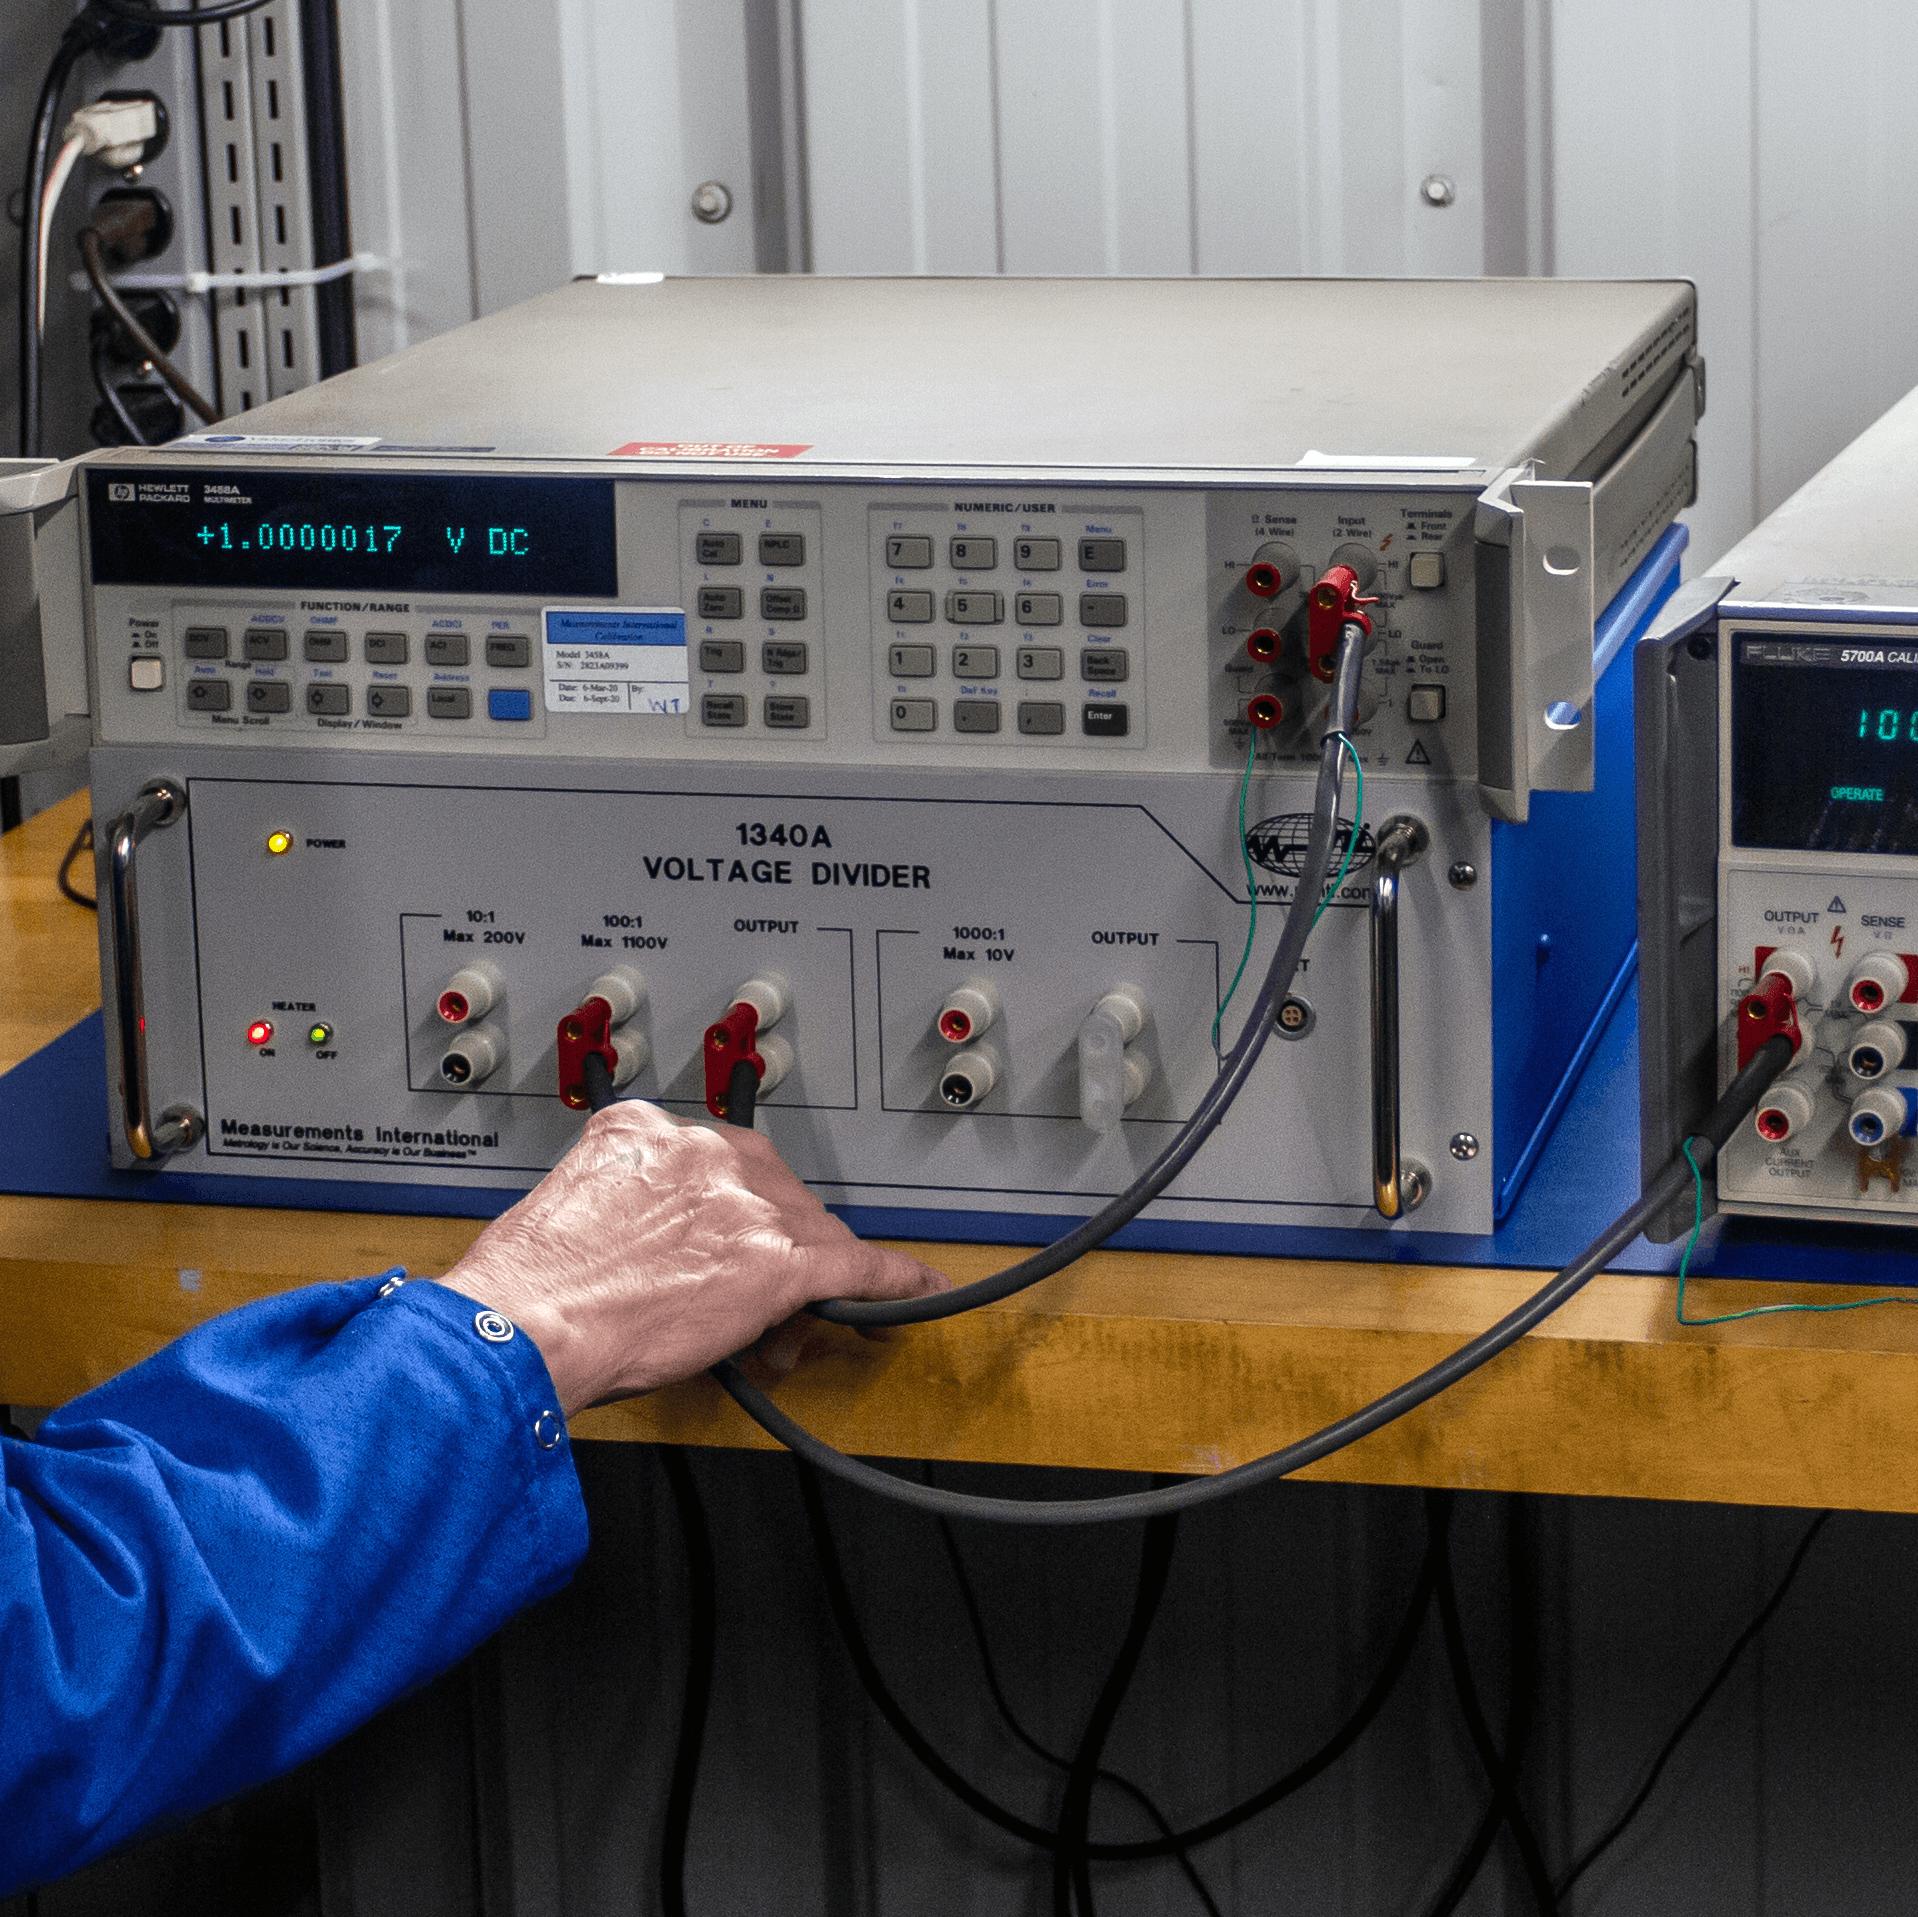 1340A High Precision Voltage Divider